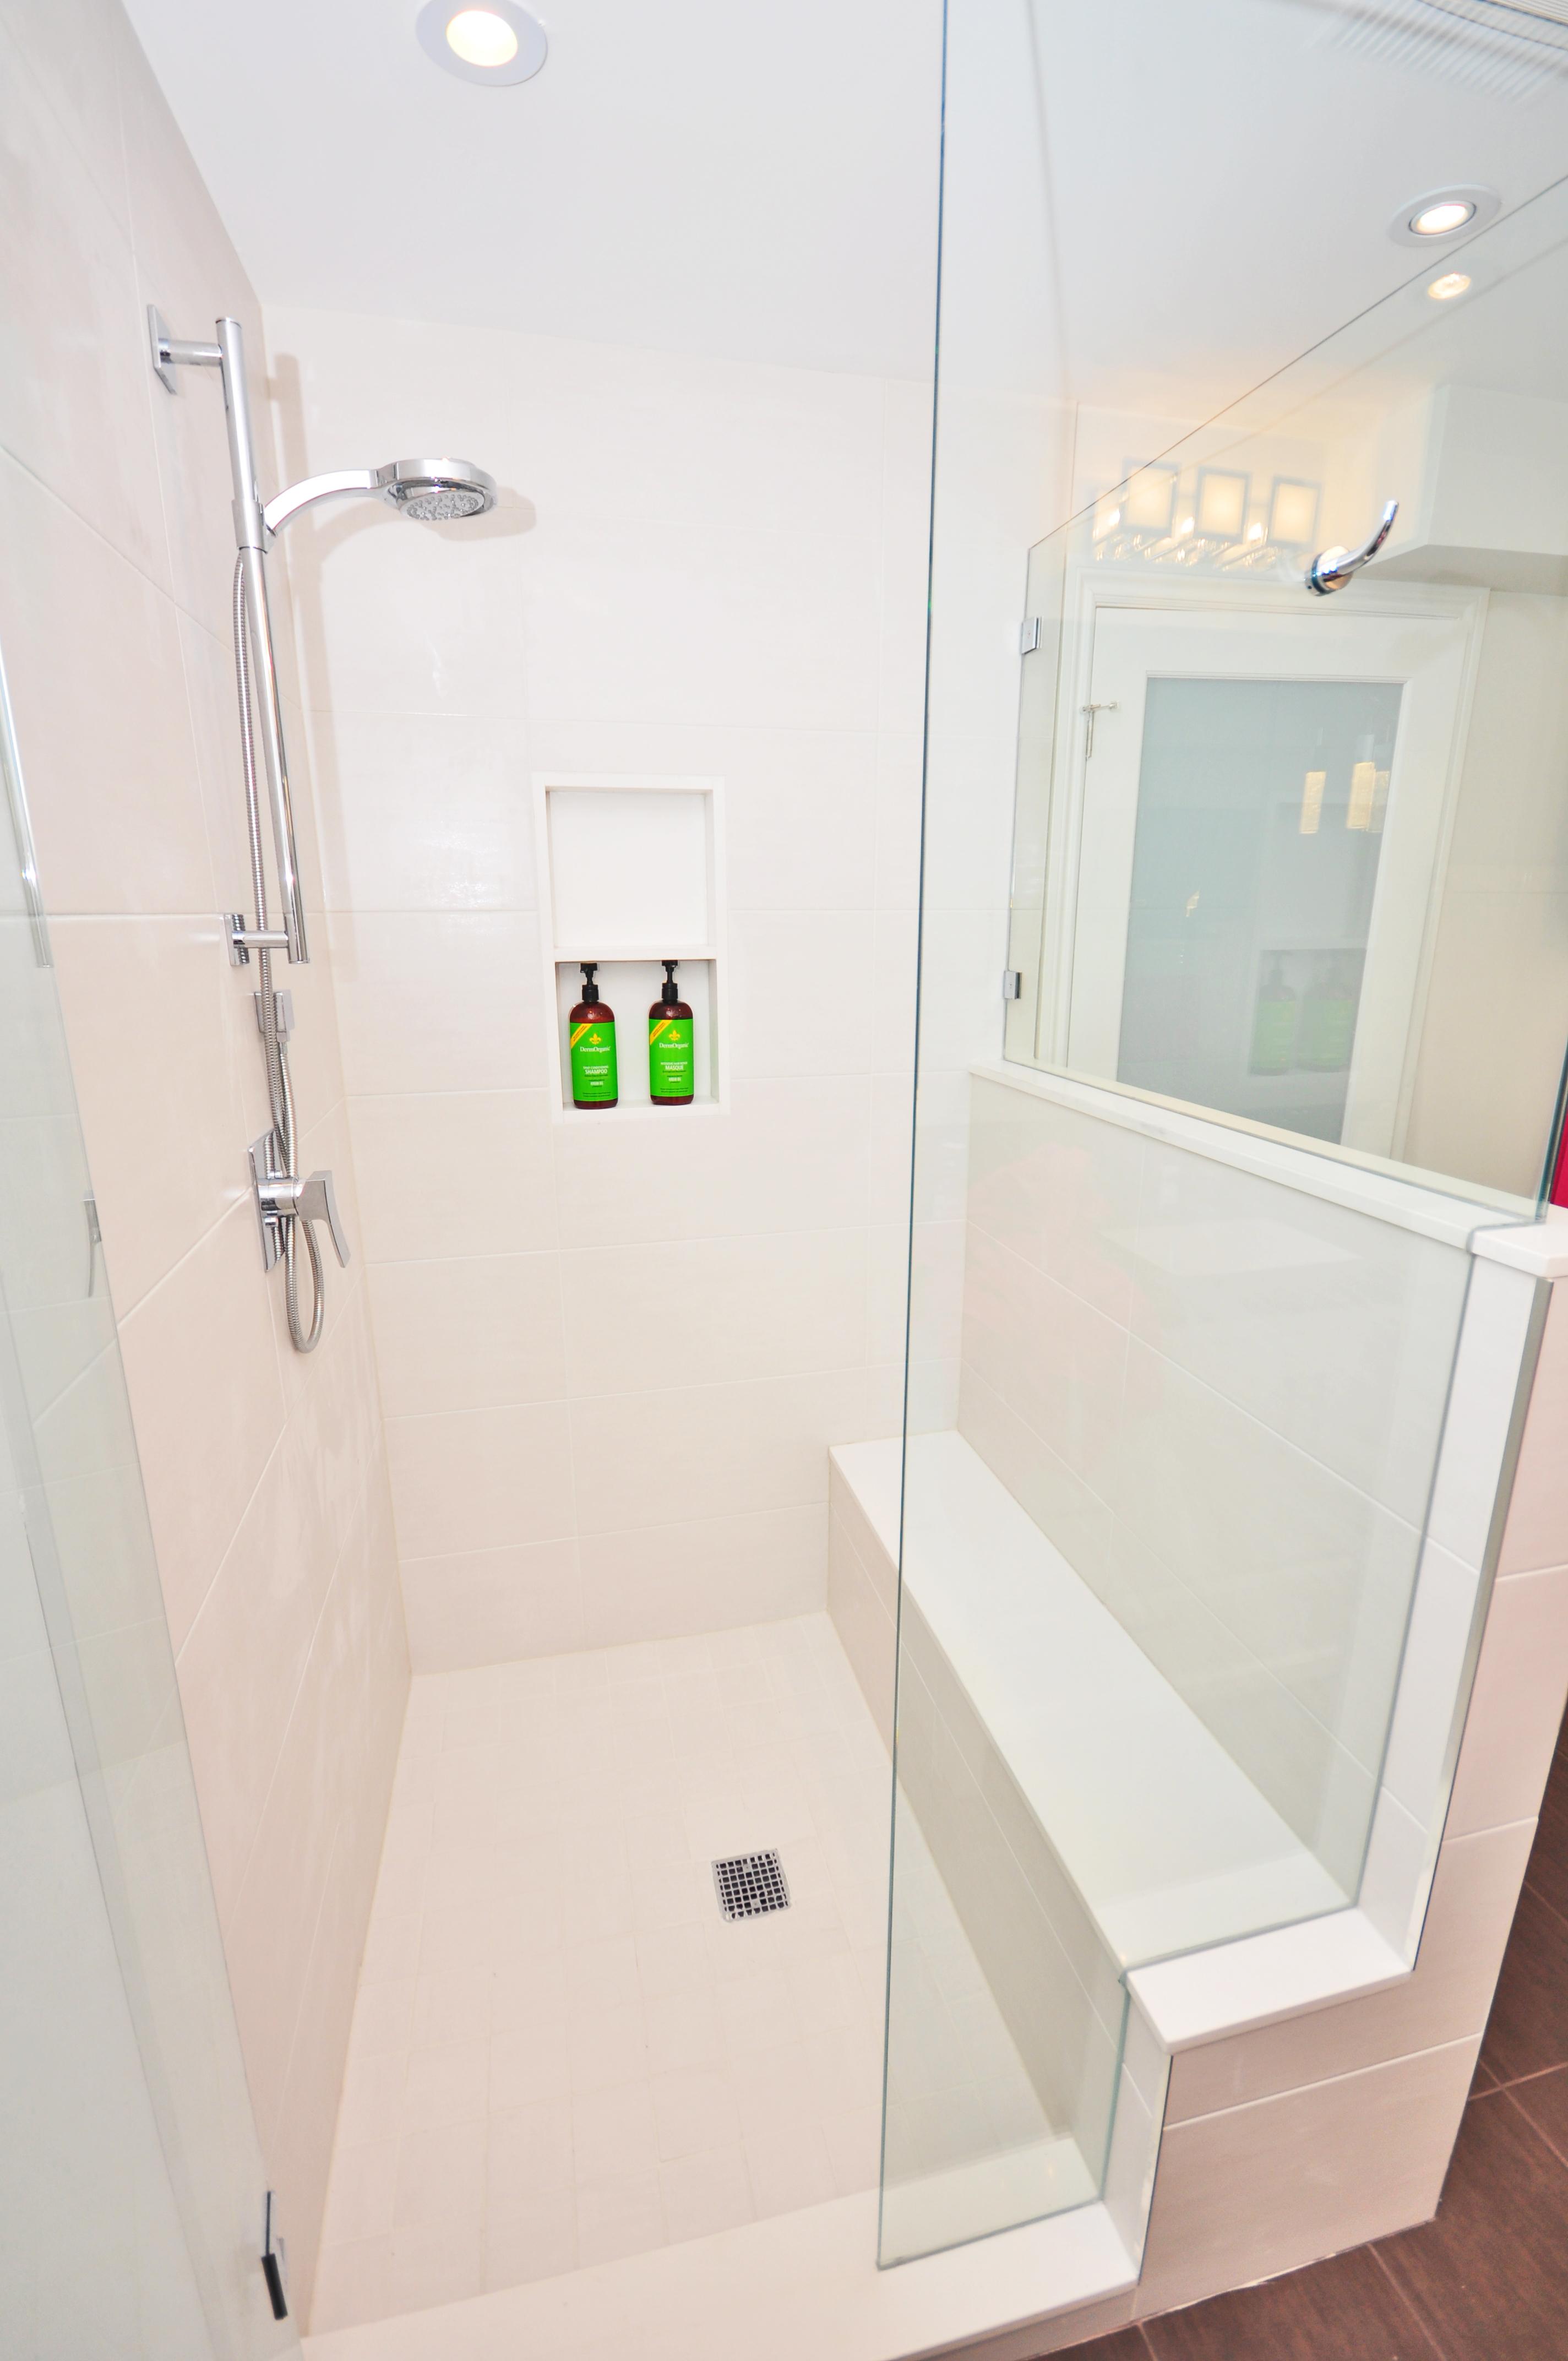 Royal Home improvments - Bathroom Renovations